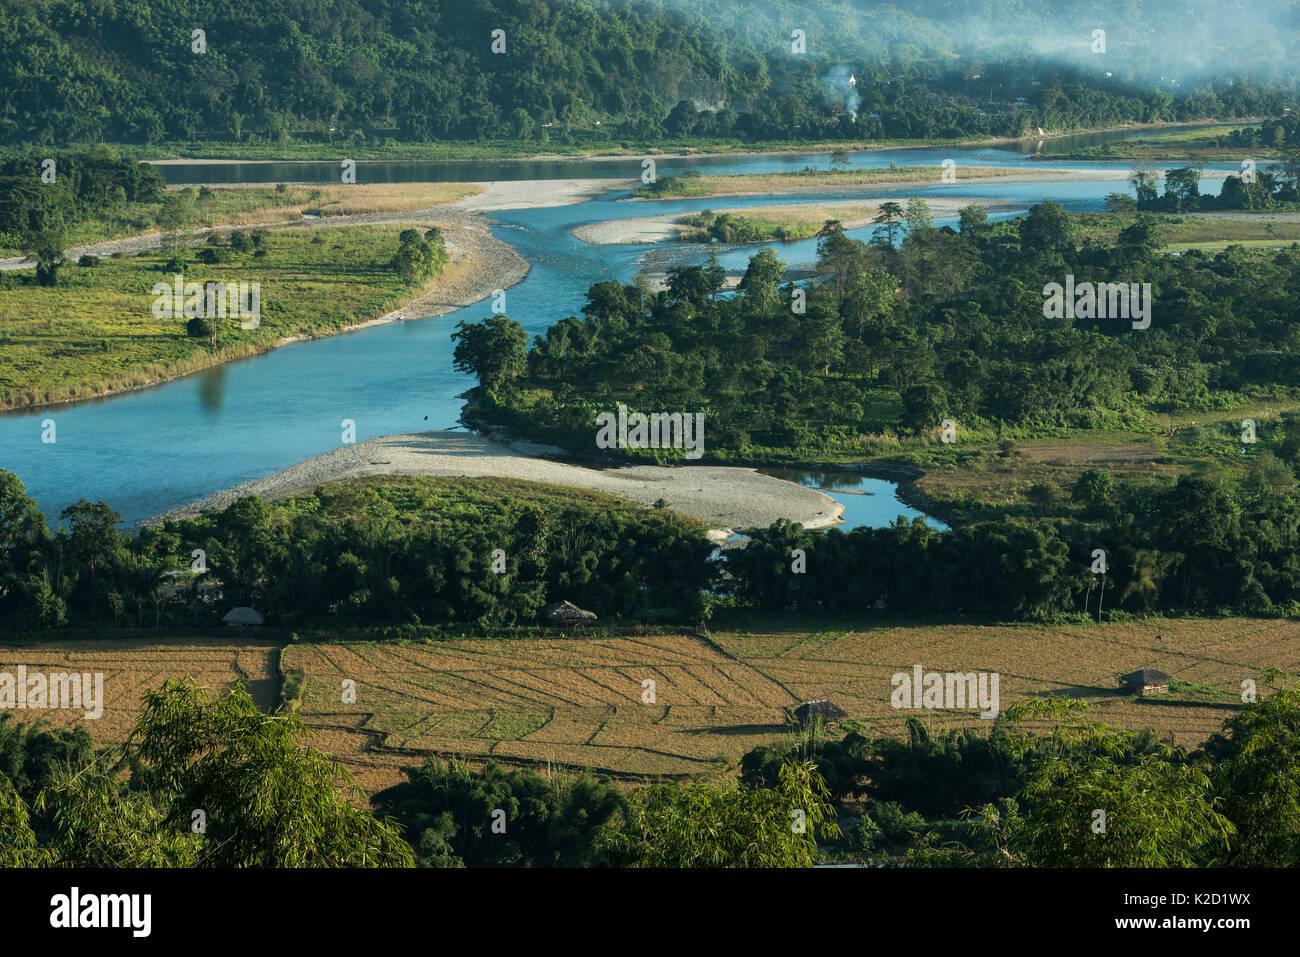 Adi Gallong rice terraces, Adi Gallong Tribe, Arunachal Pradesh, North East India, November 2014. - Stock Image